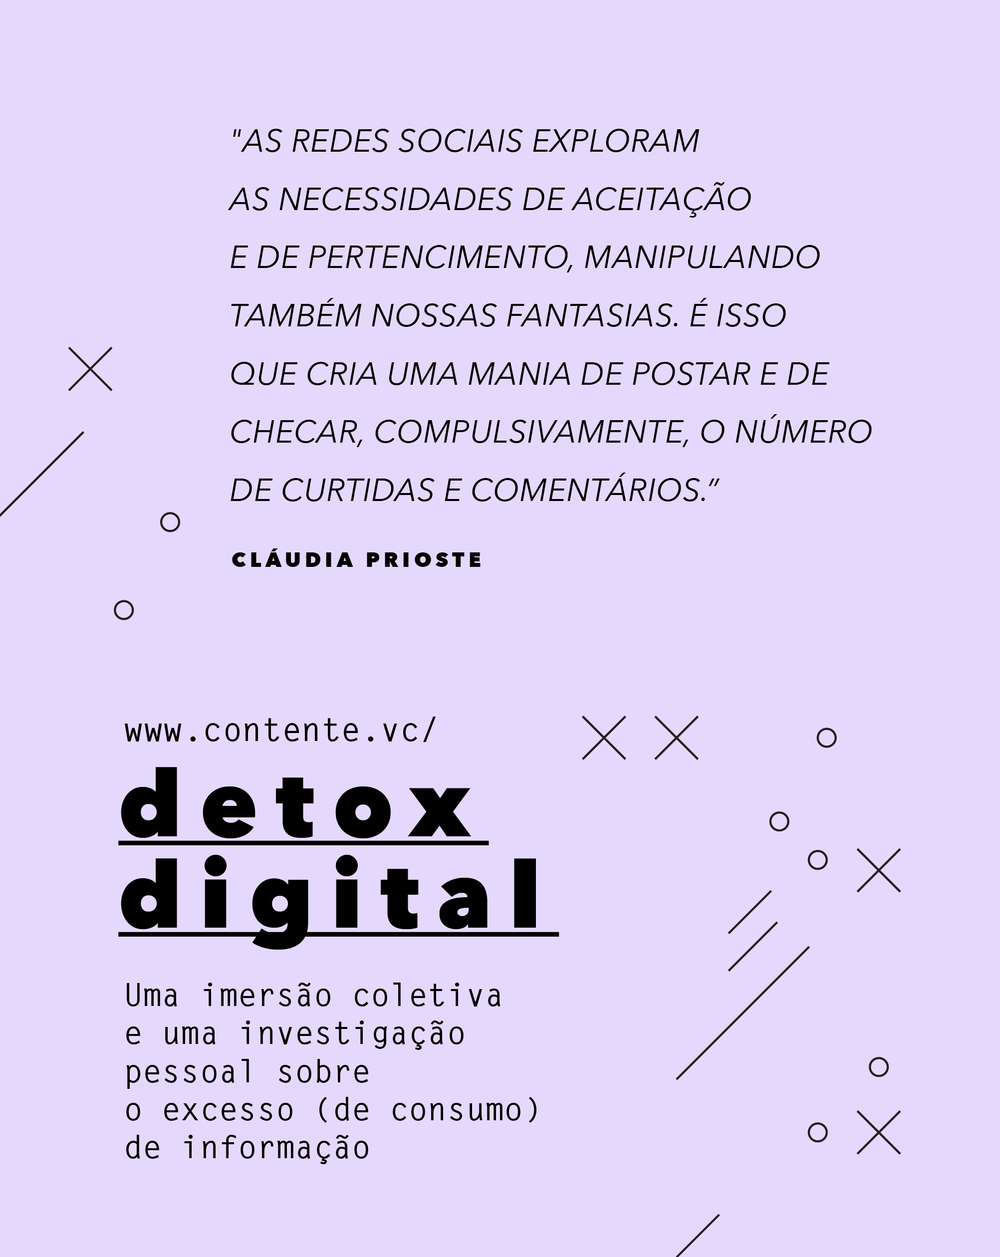 dettoxdigital-06.png